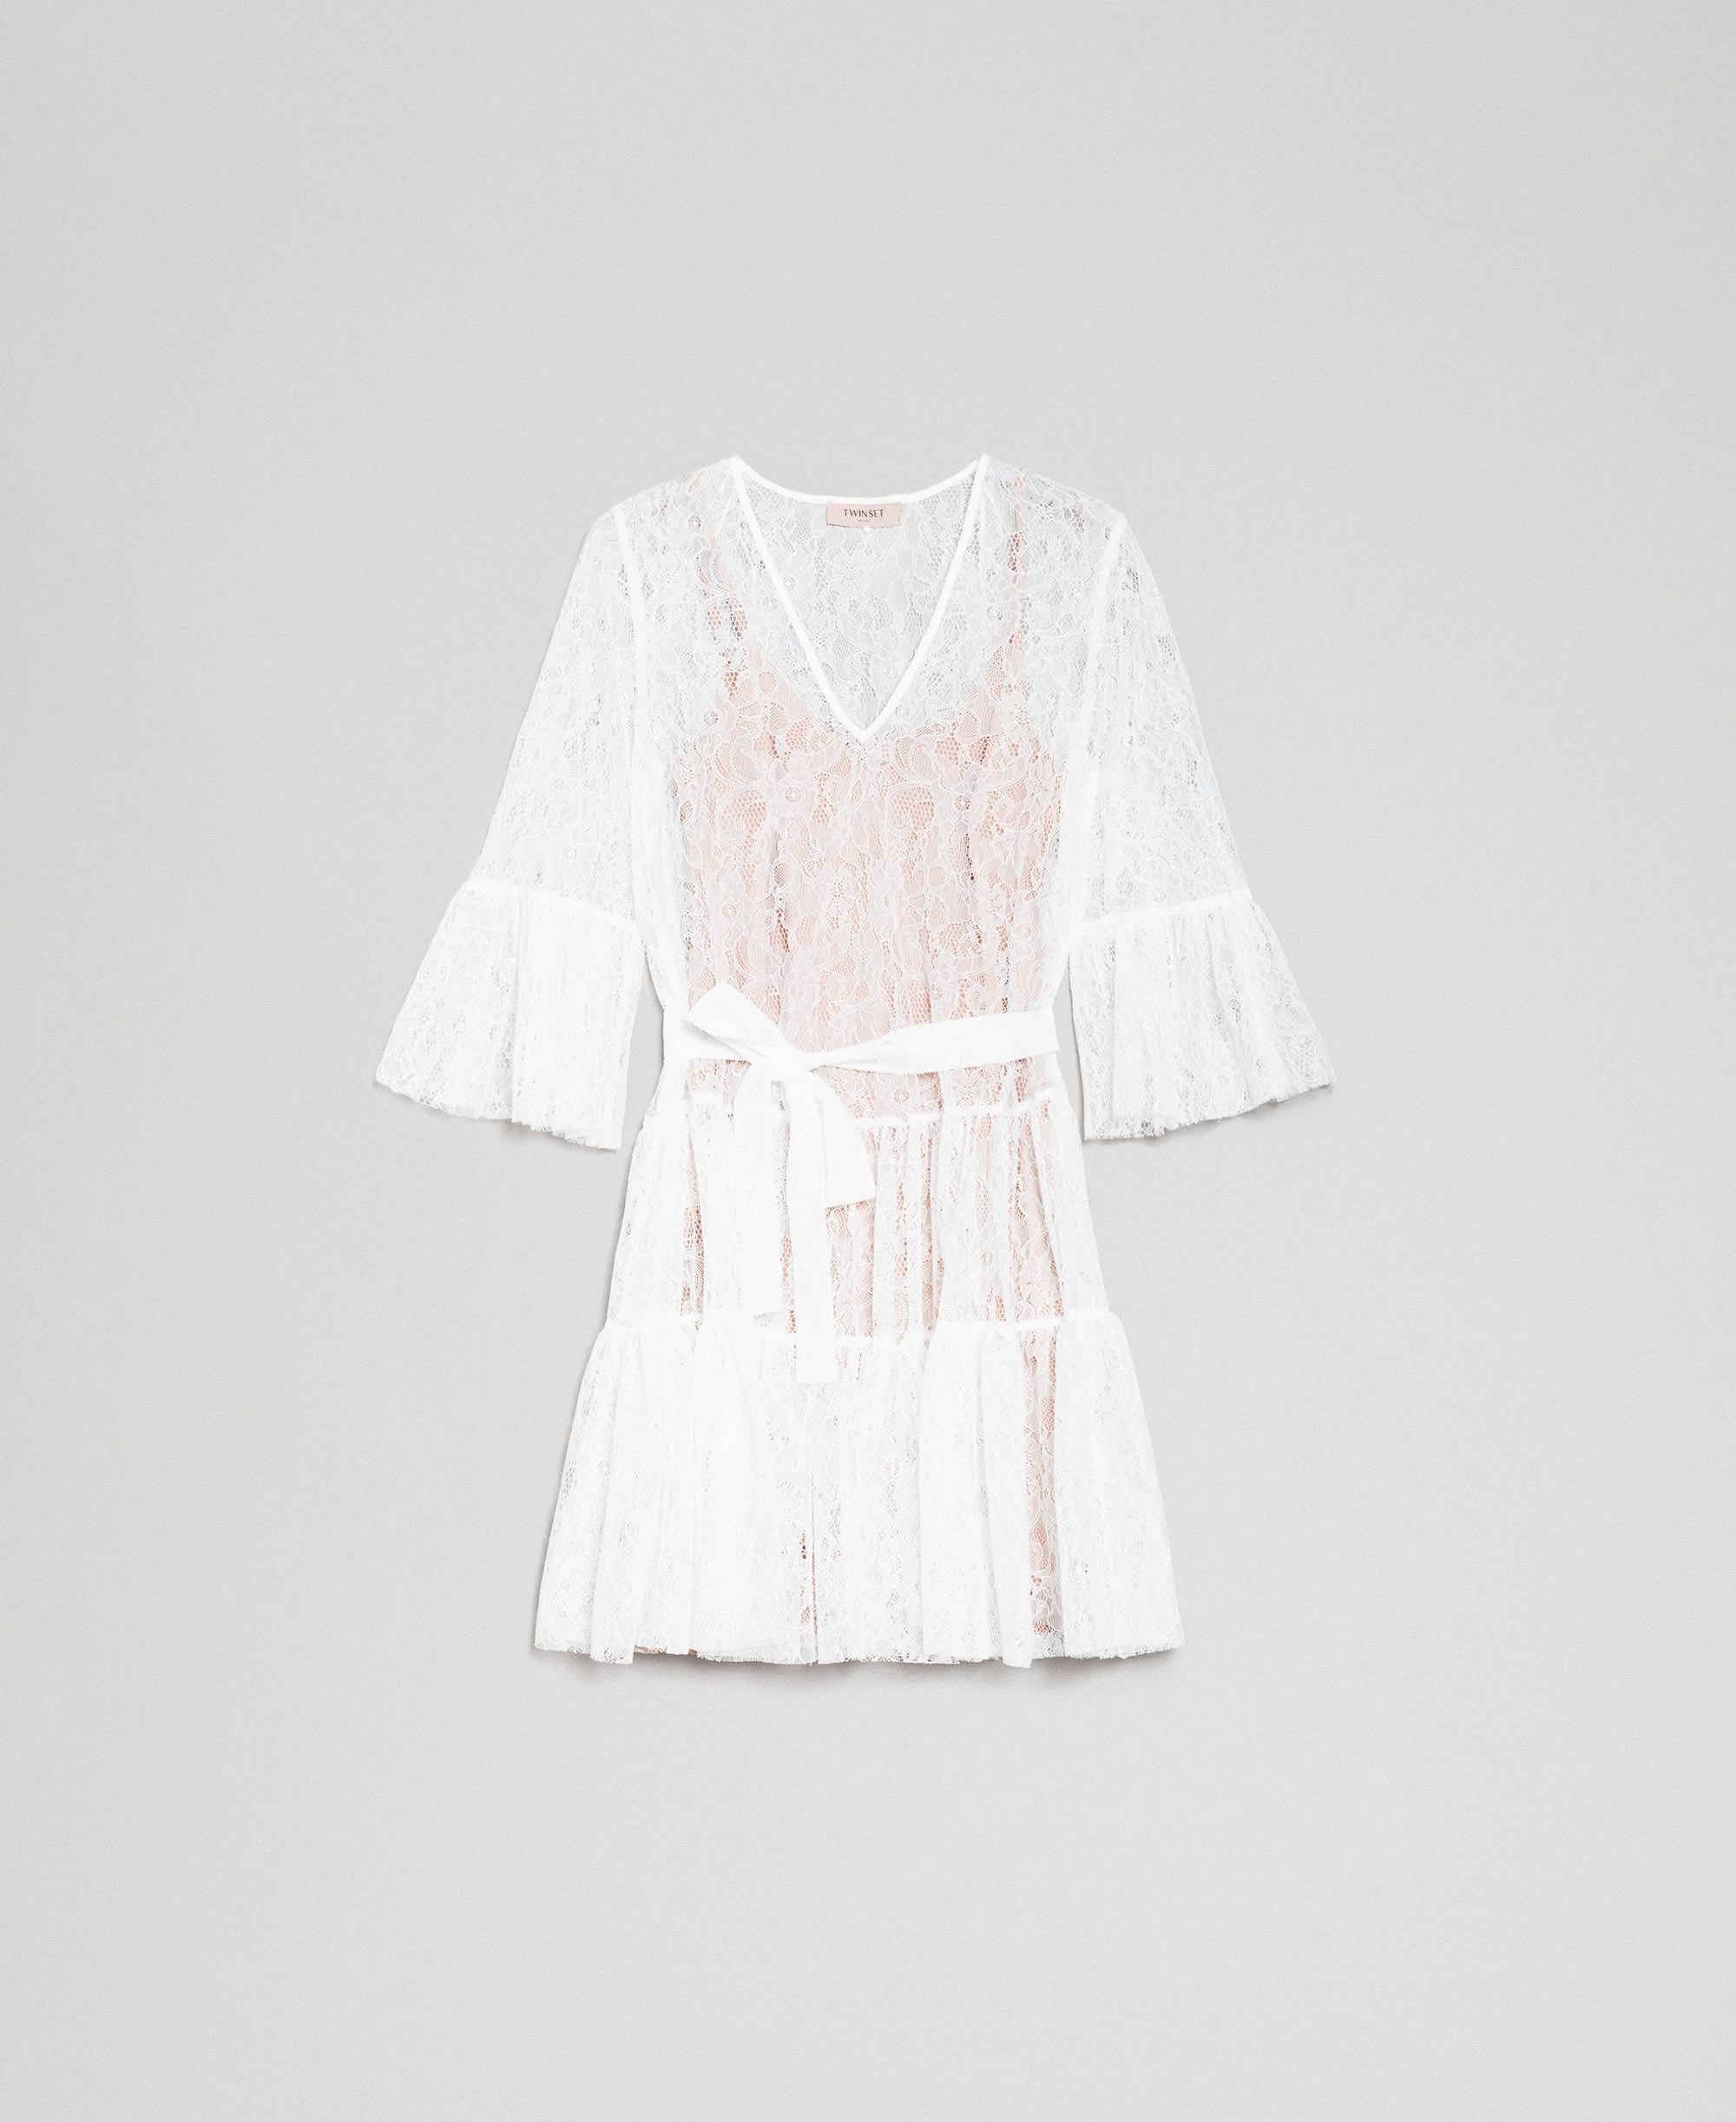 Robe En Dentelle Avec Ceinture Femme Blanc Twinset Milano